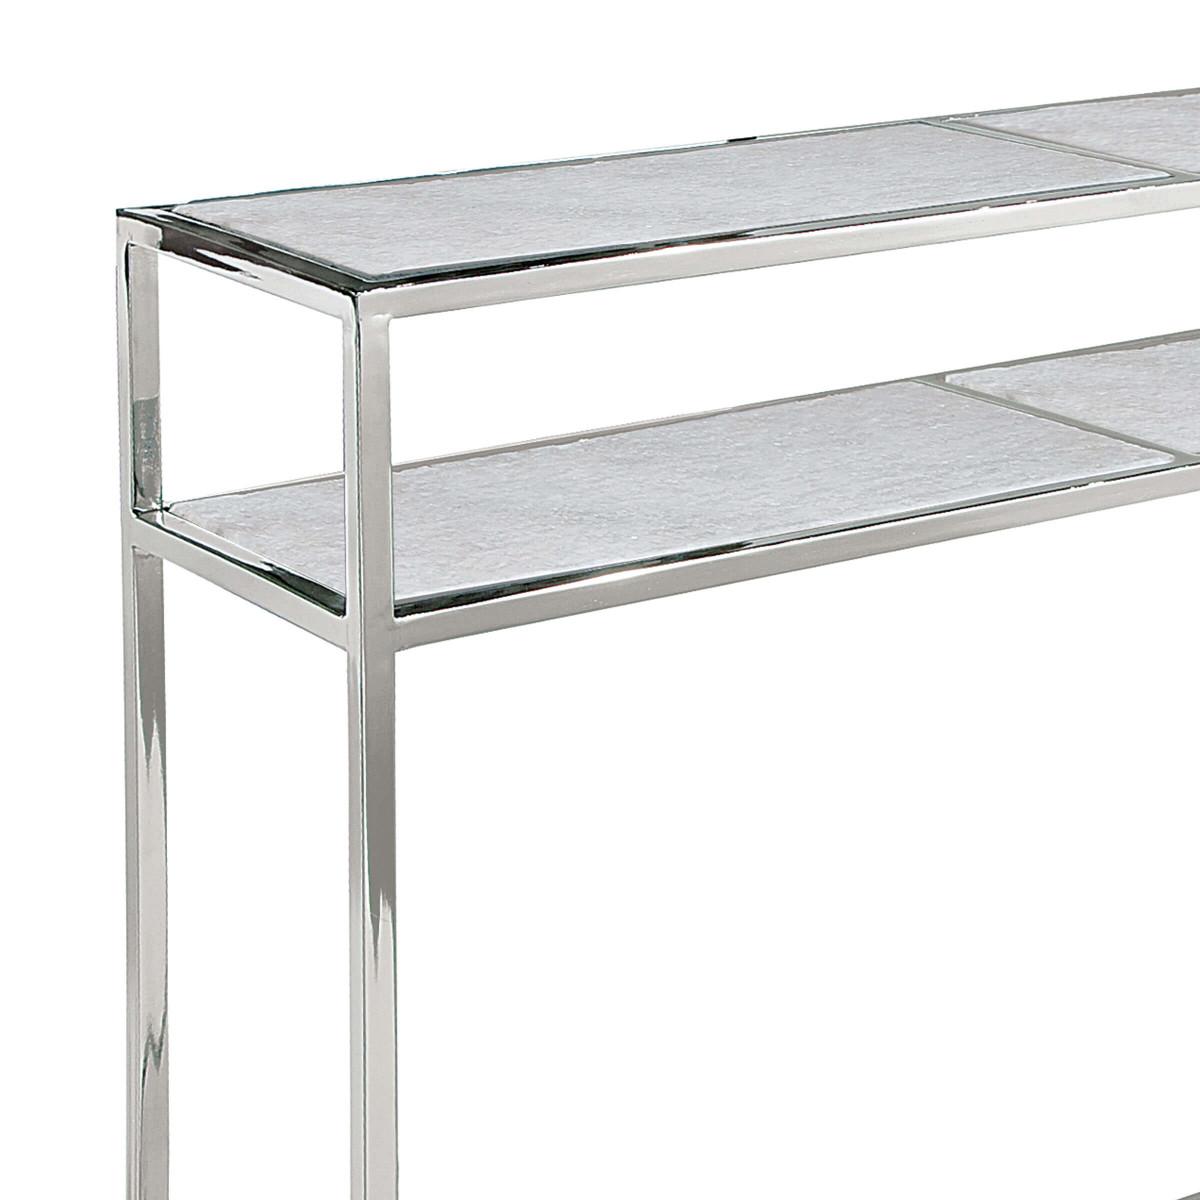 Sima Console Table | Nickel